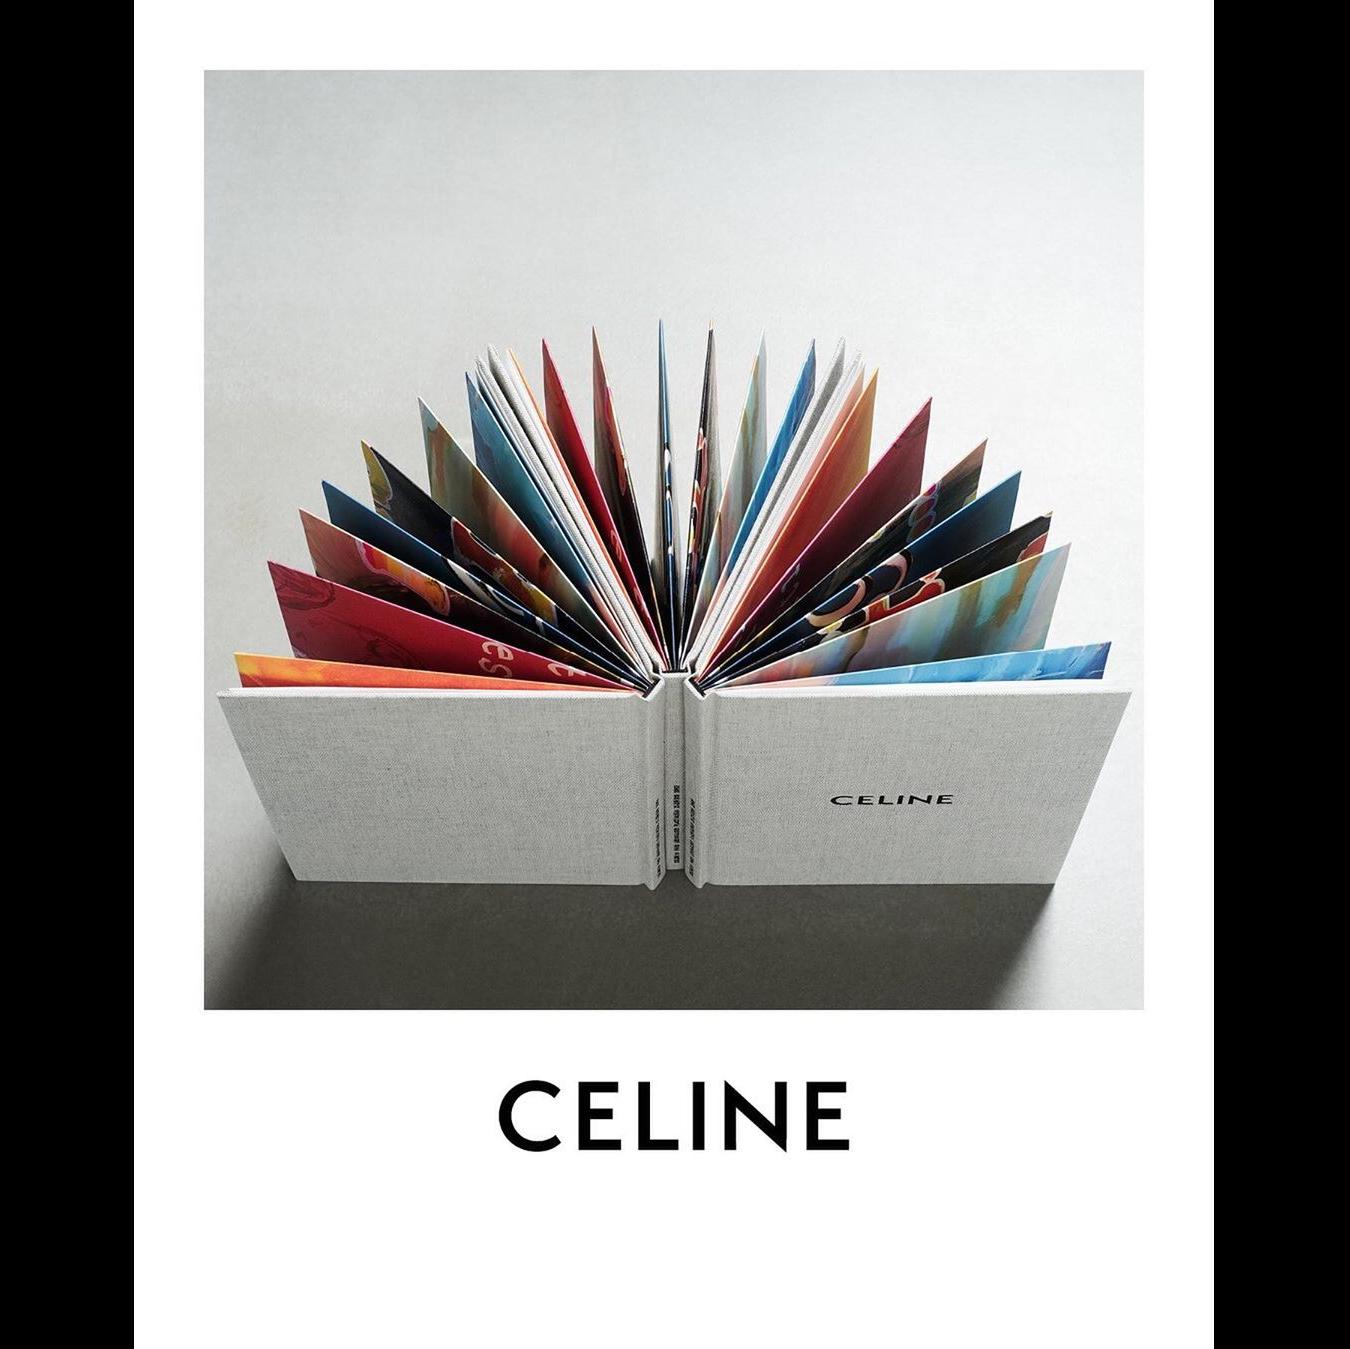 <p>CELINE 2020 春夏男裝大秀</p>